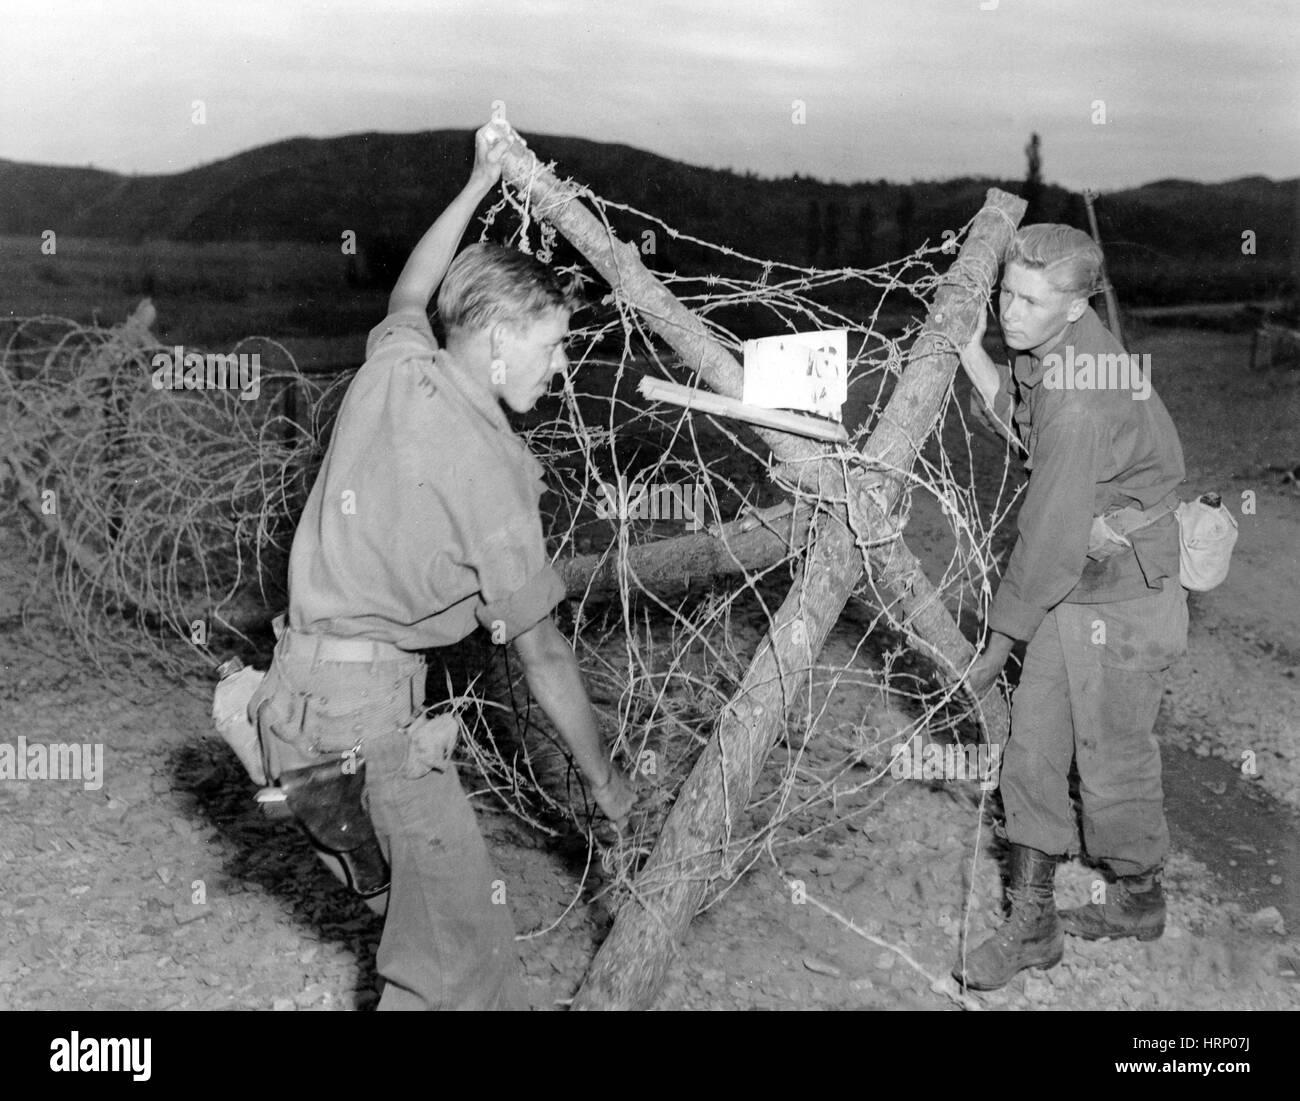 Korean War, Barbed Wire Entanglement, 1951 - Stock Image